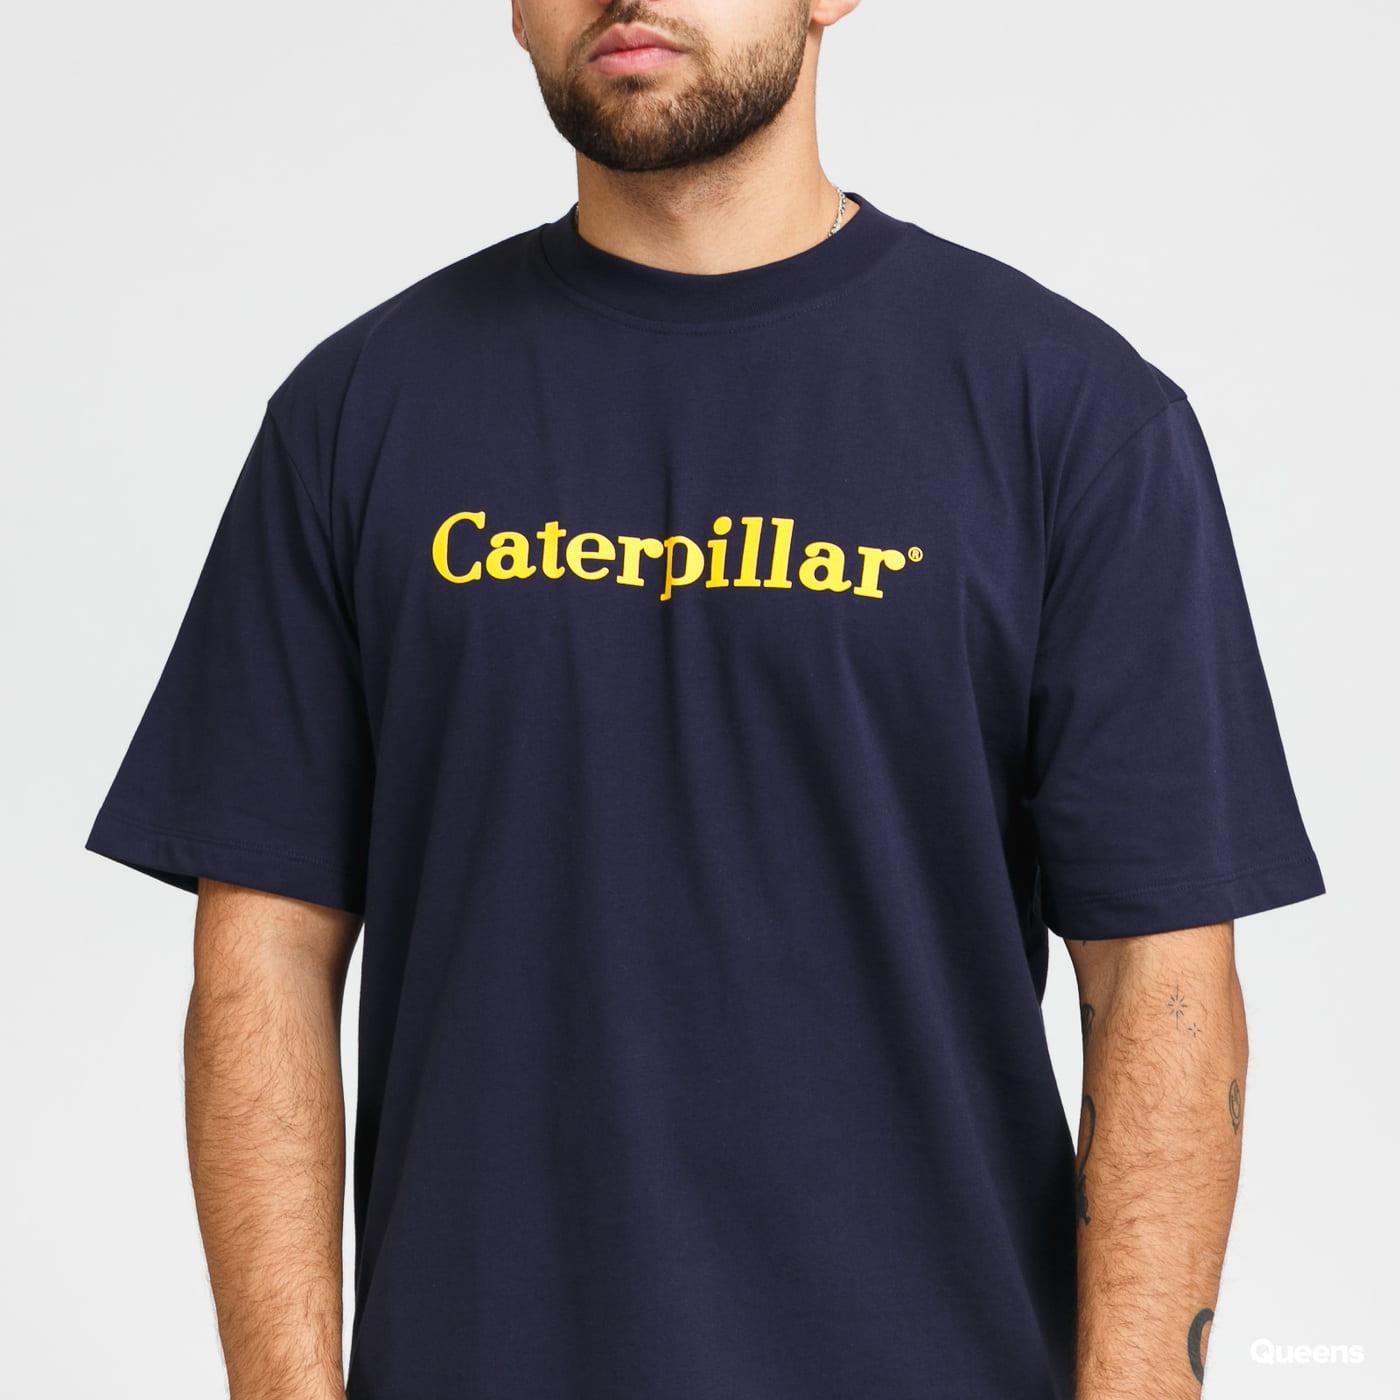 CATERPILLAR Basic Tee navy